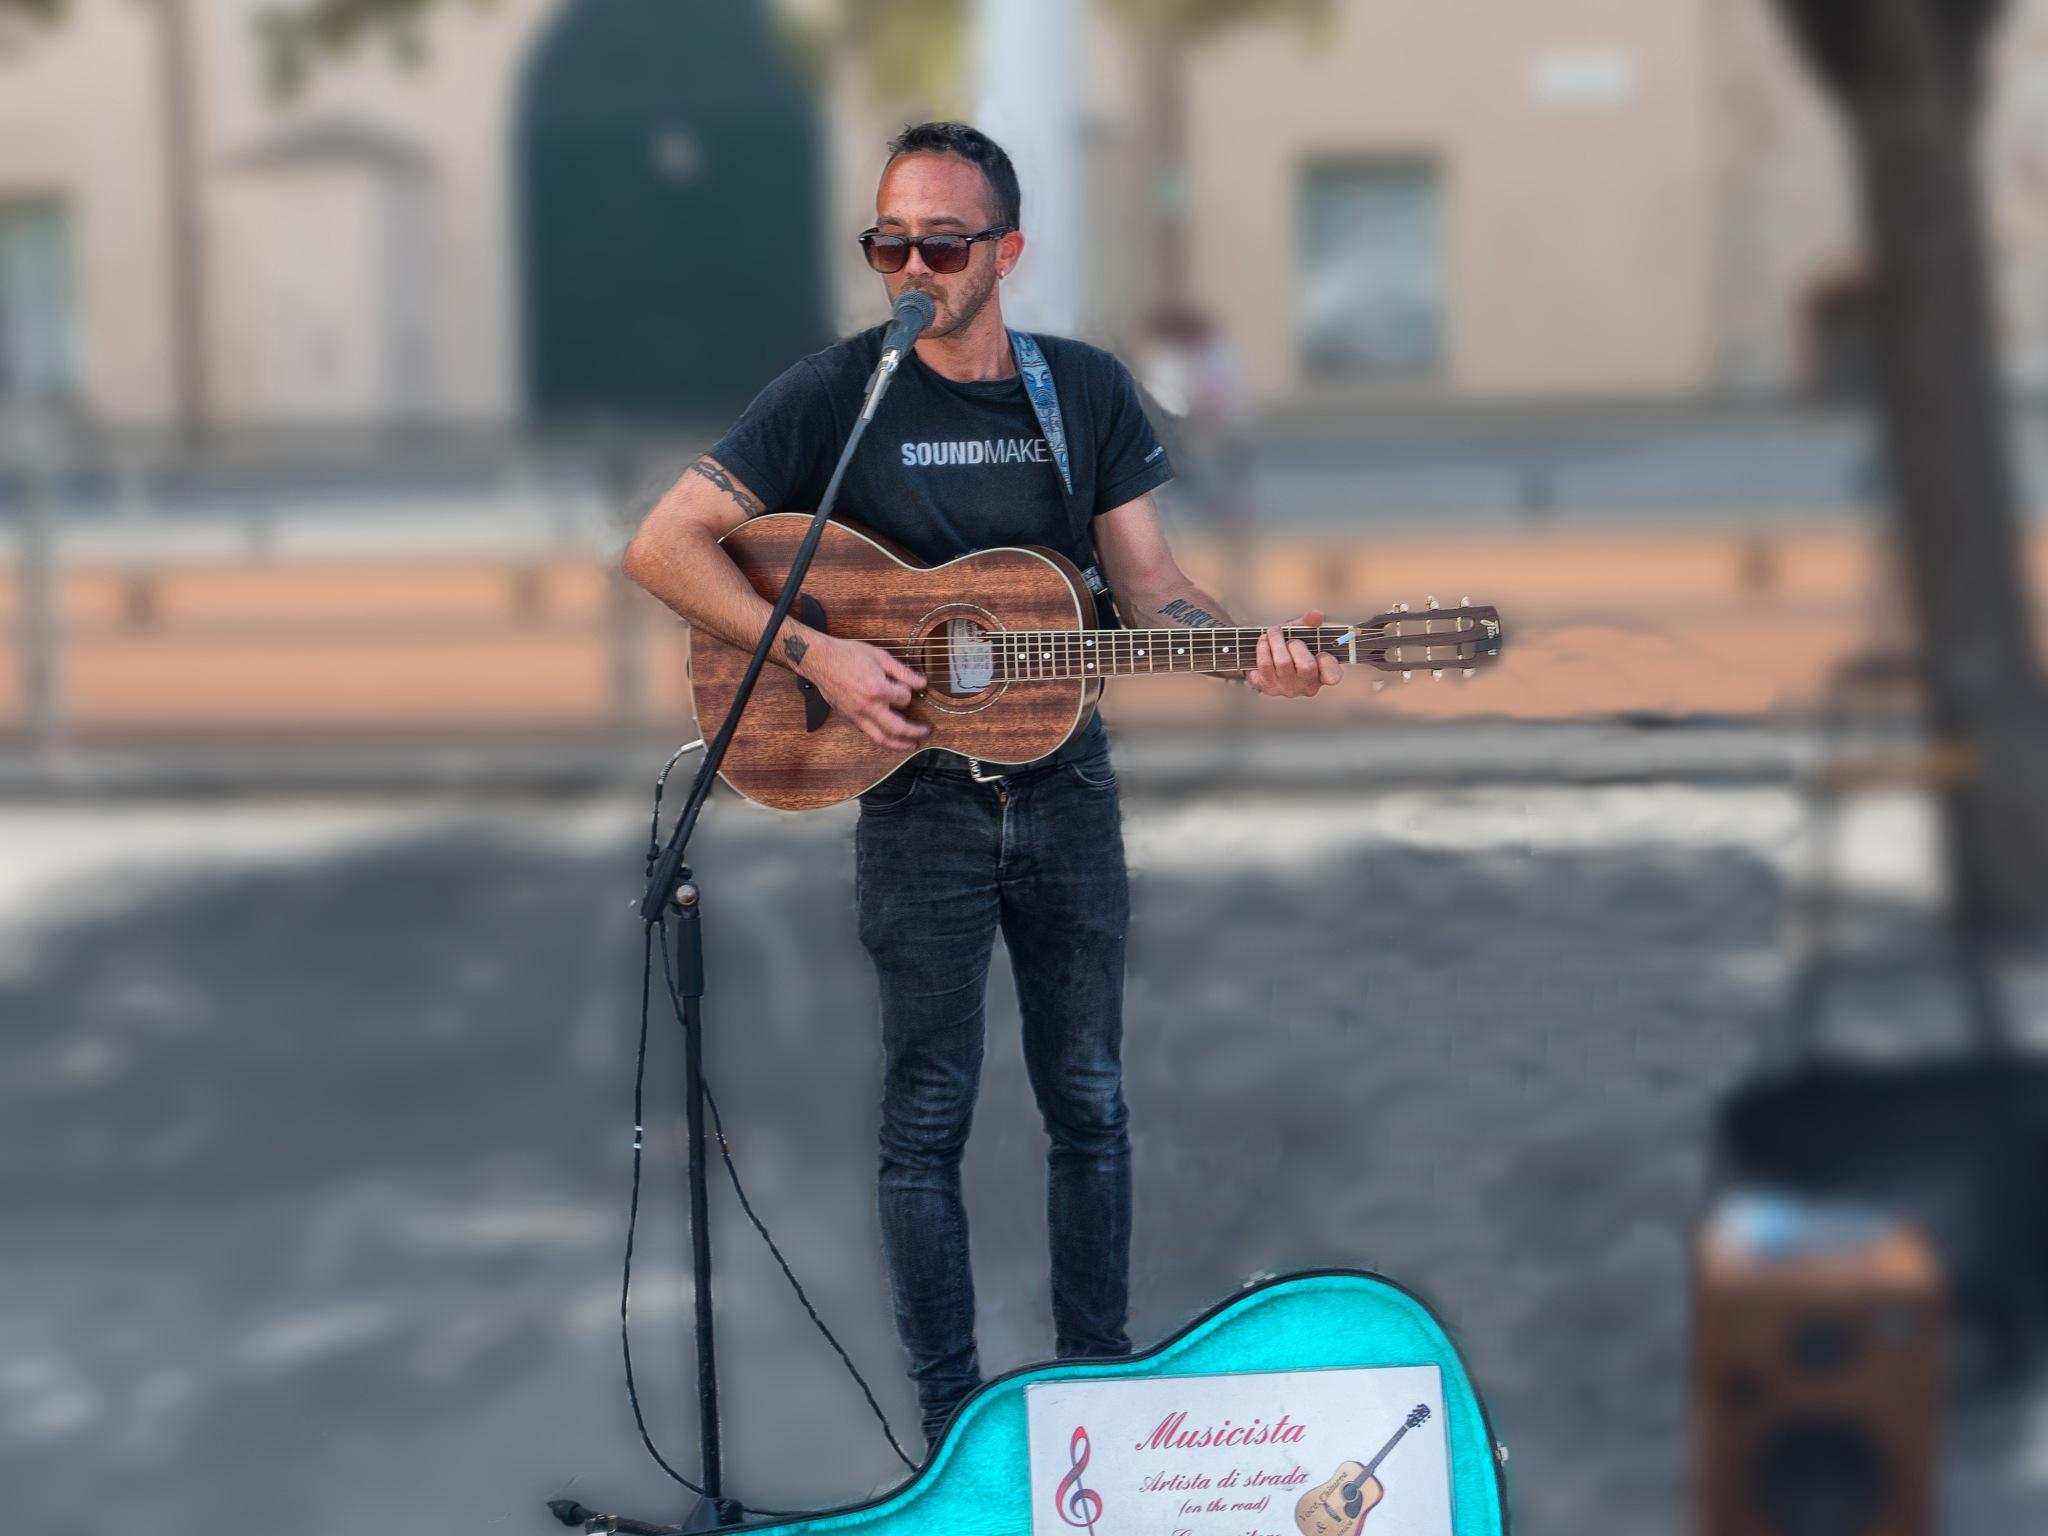 street artist musician by sunrisesunset